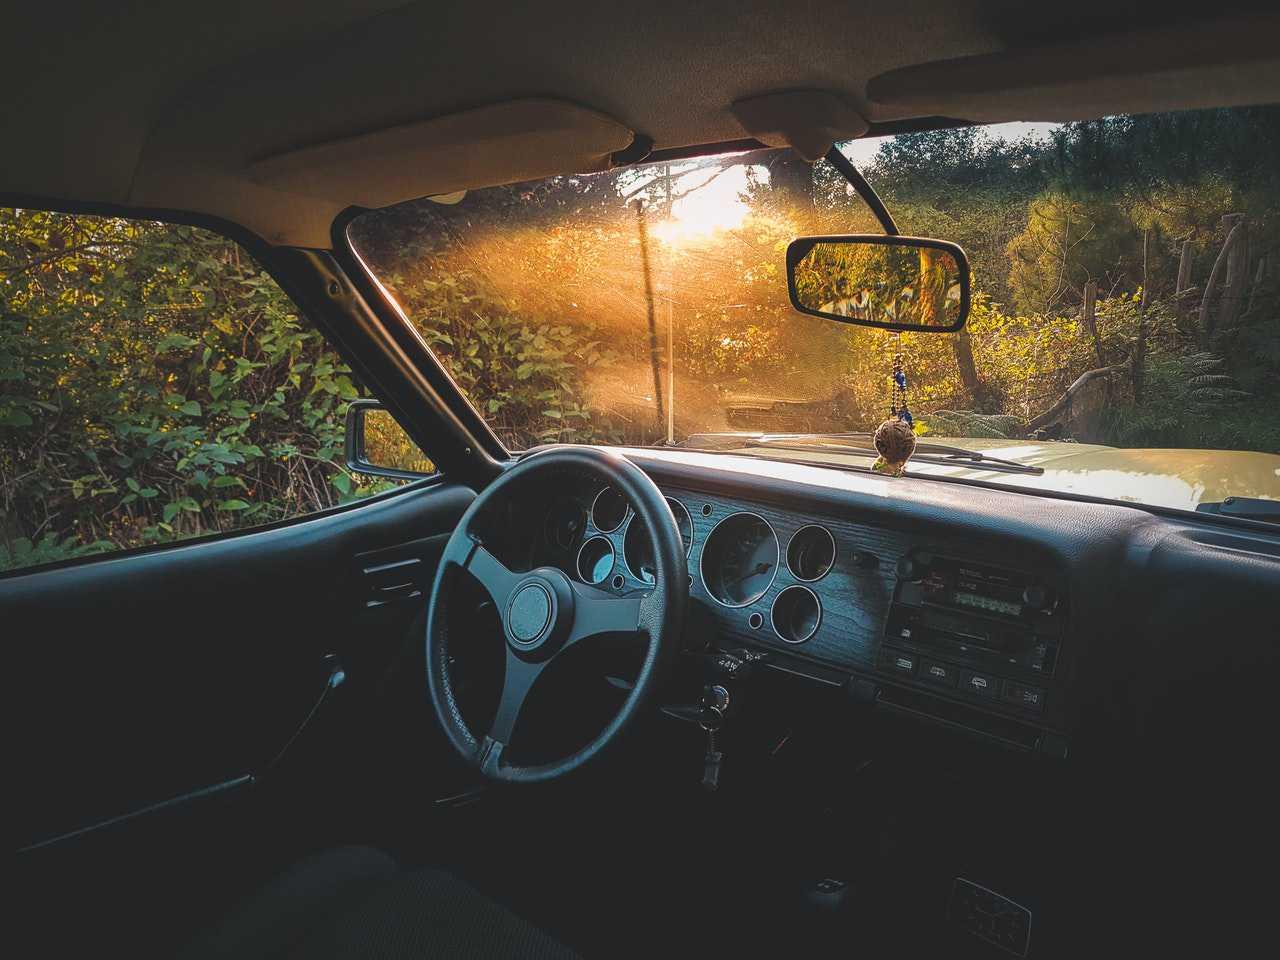 Inside an Old Car | Goodwill Car Donations